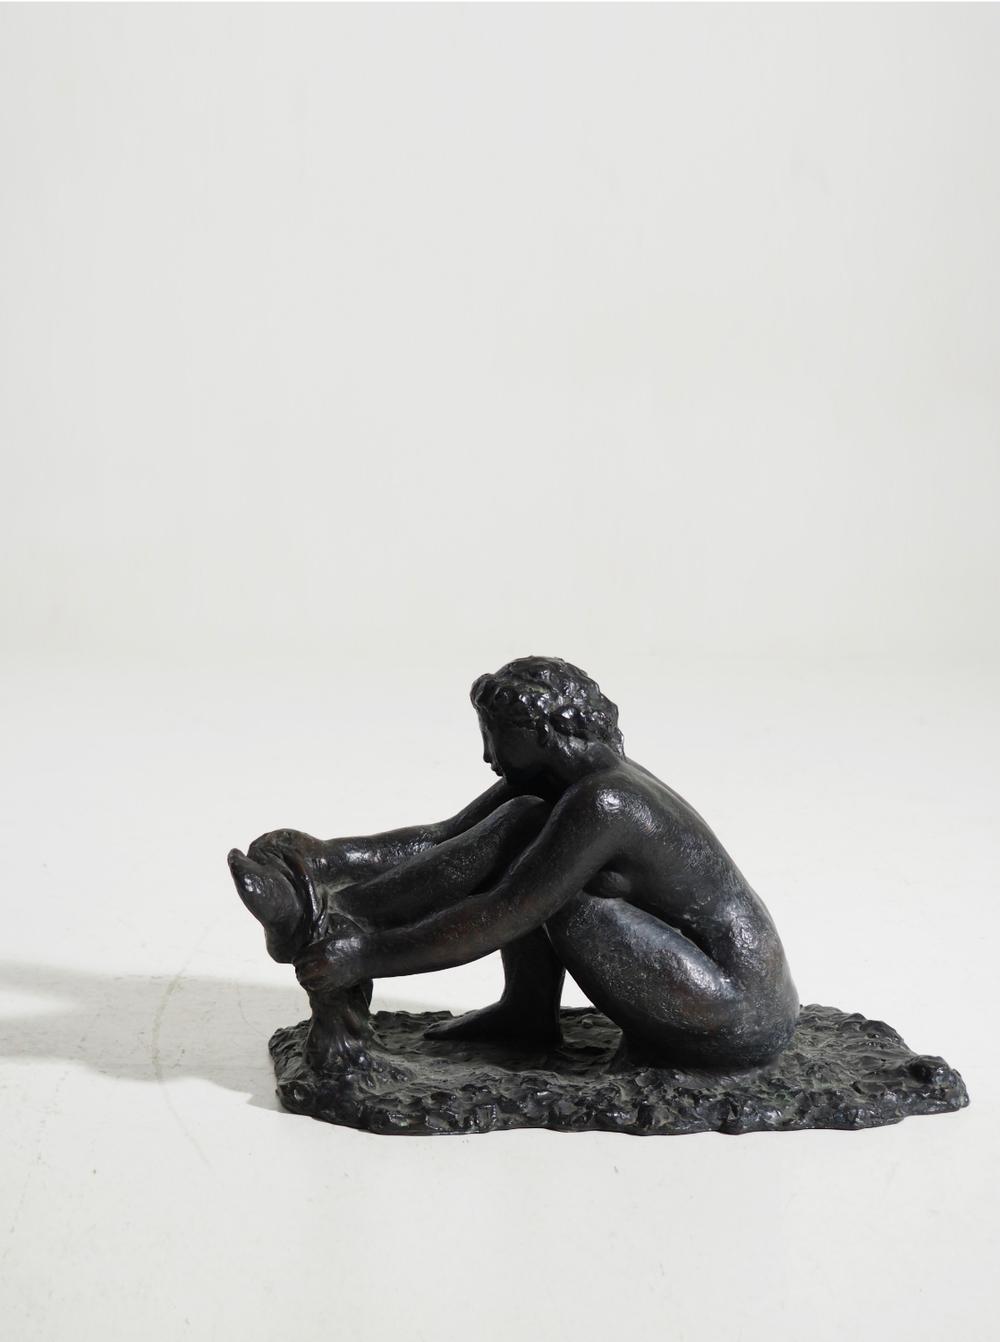 Very bronze statue signed by Garhard Henning.